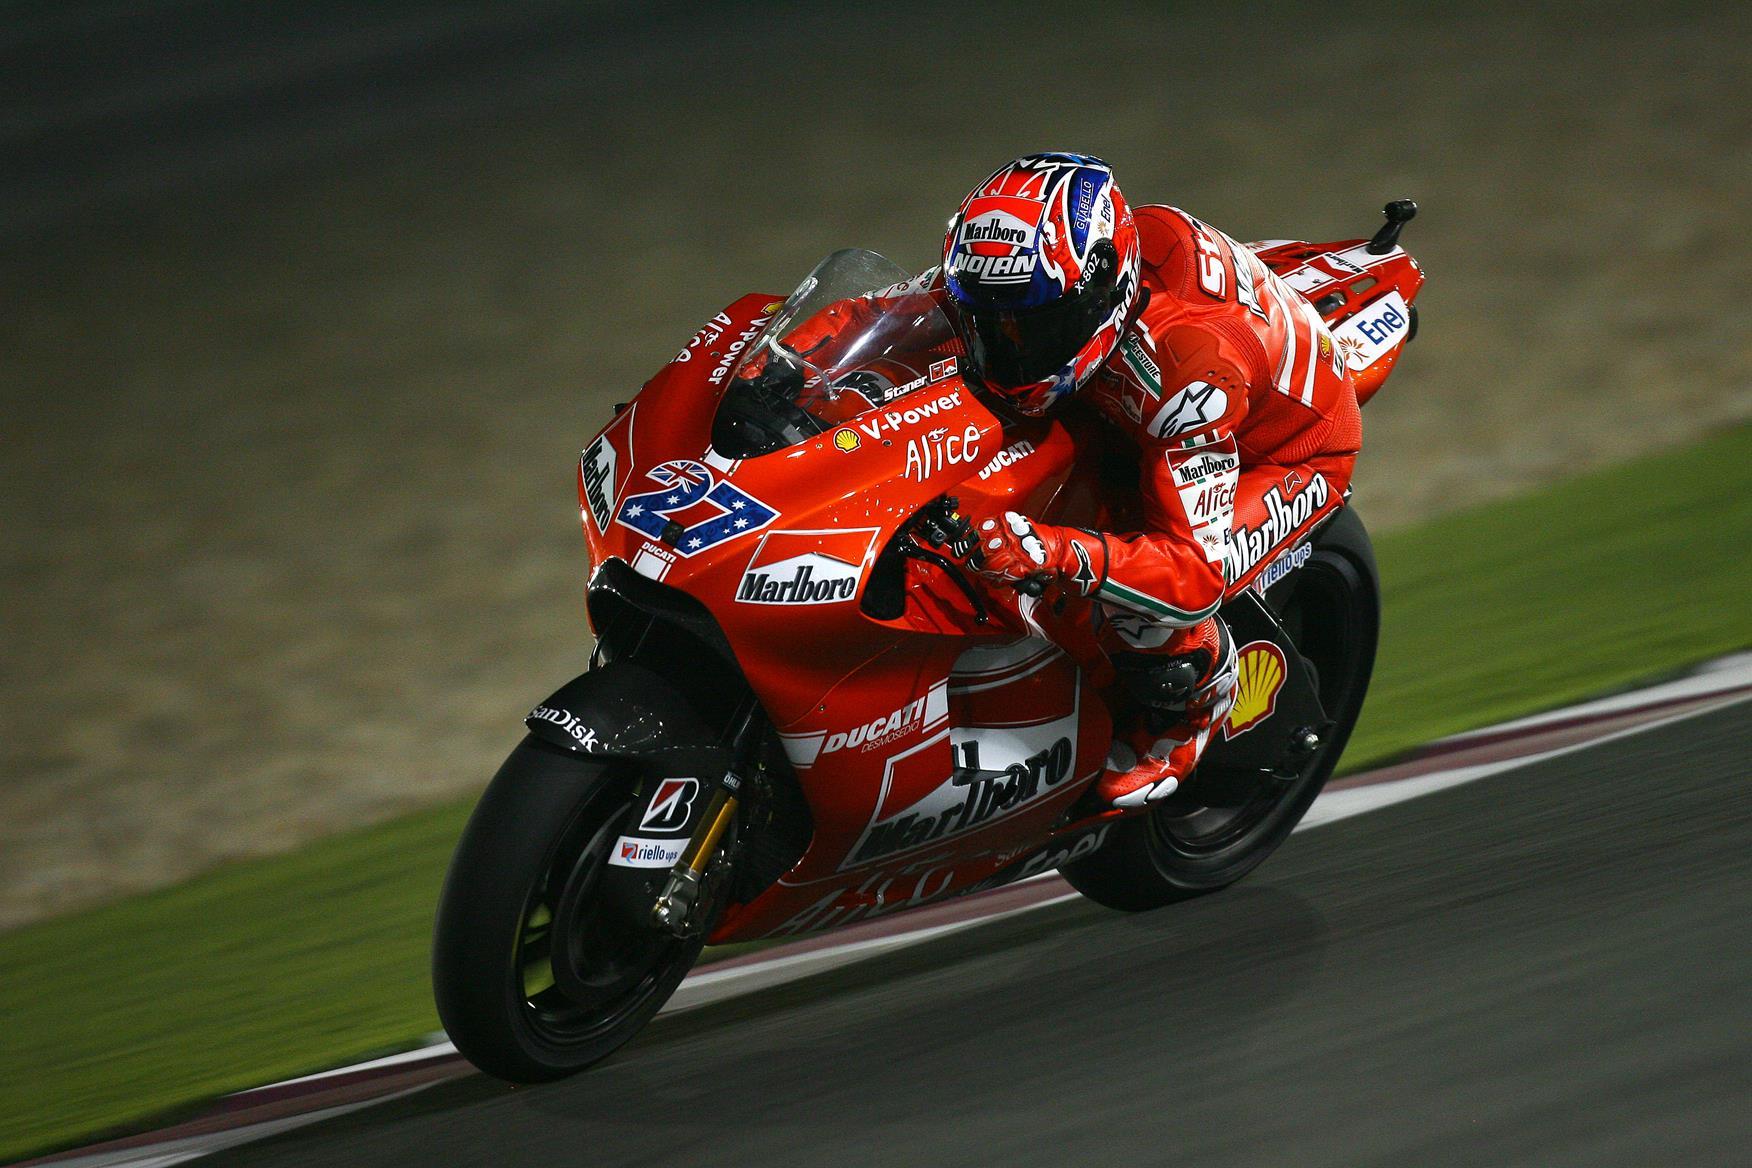 Qatar MotoGP: Casey Stoner takes first pole of 2009